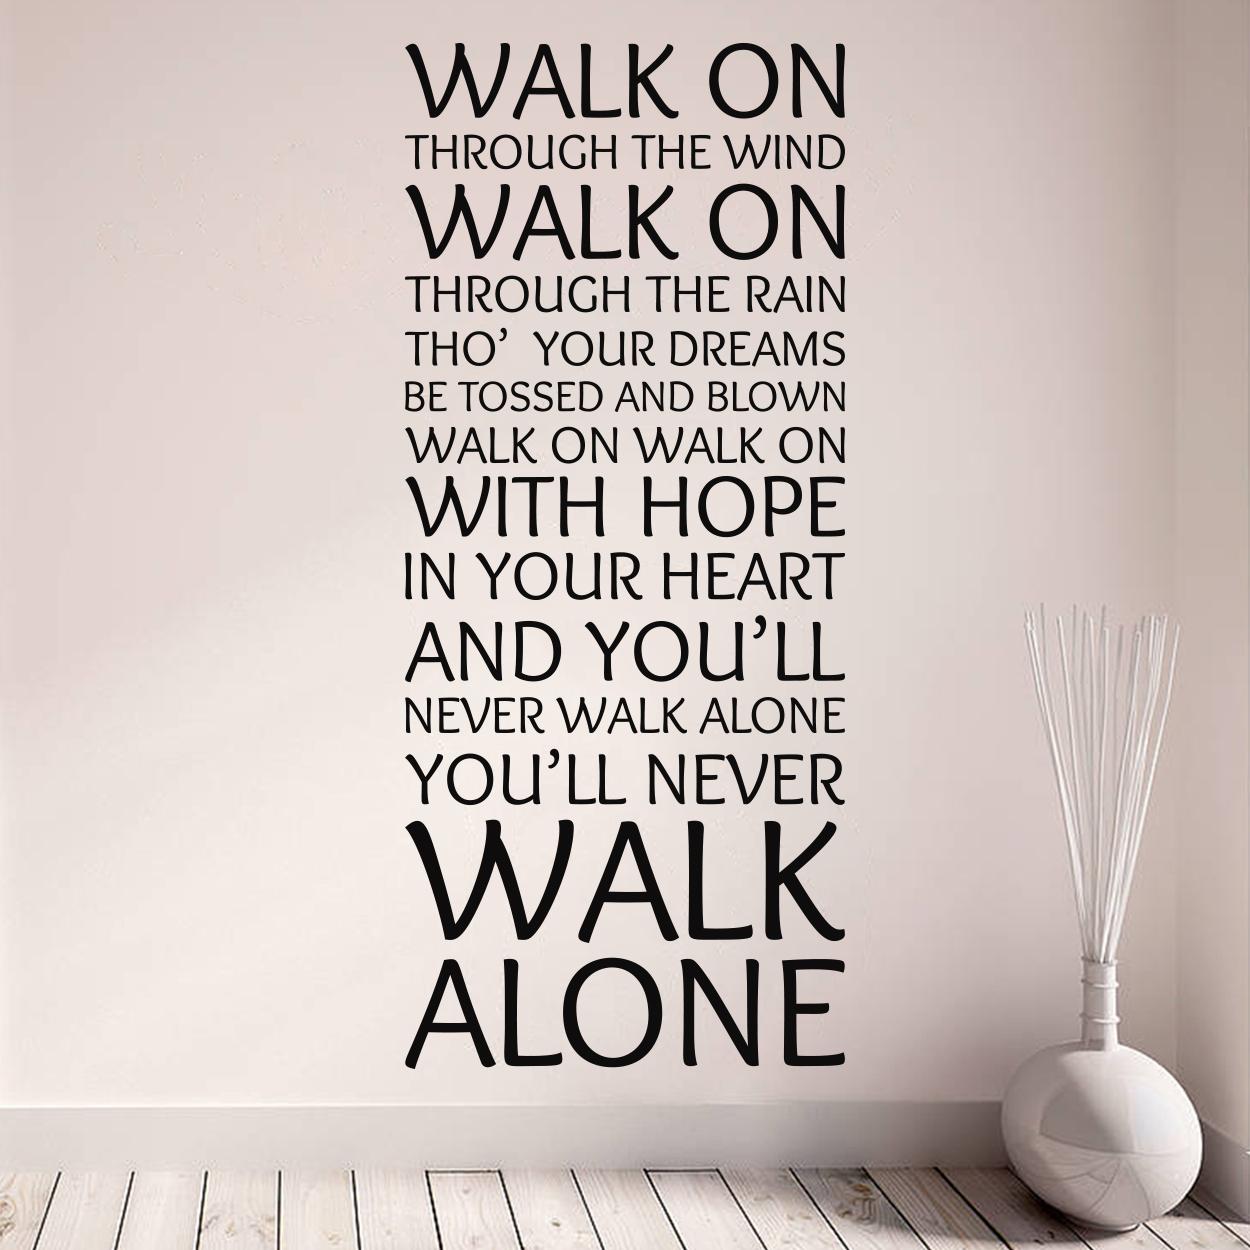 liverpool never walk alone wallsticker fra 169 kr pics photos liverpool fc wall decal